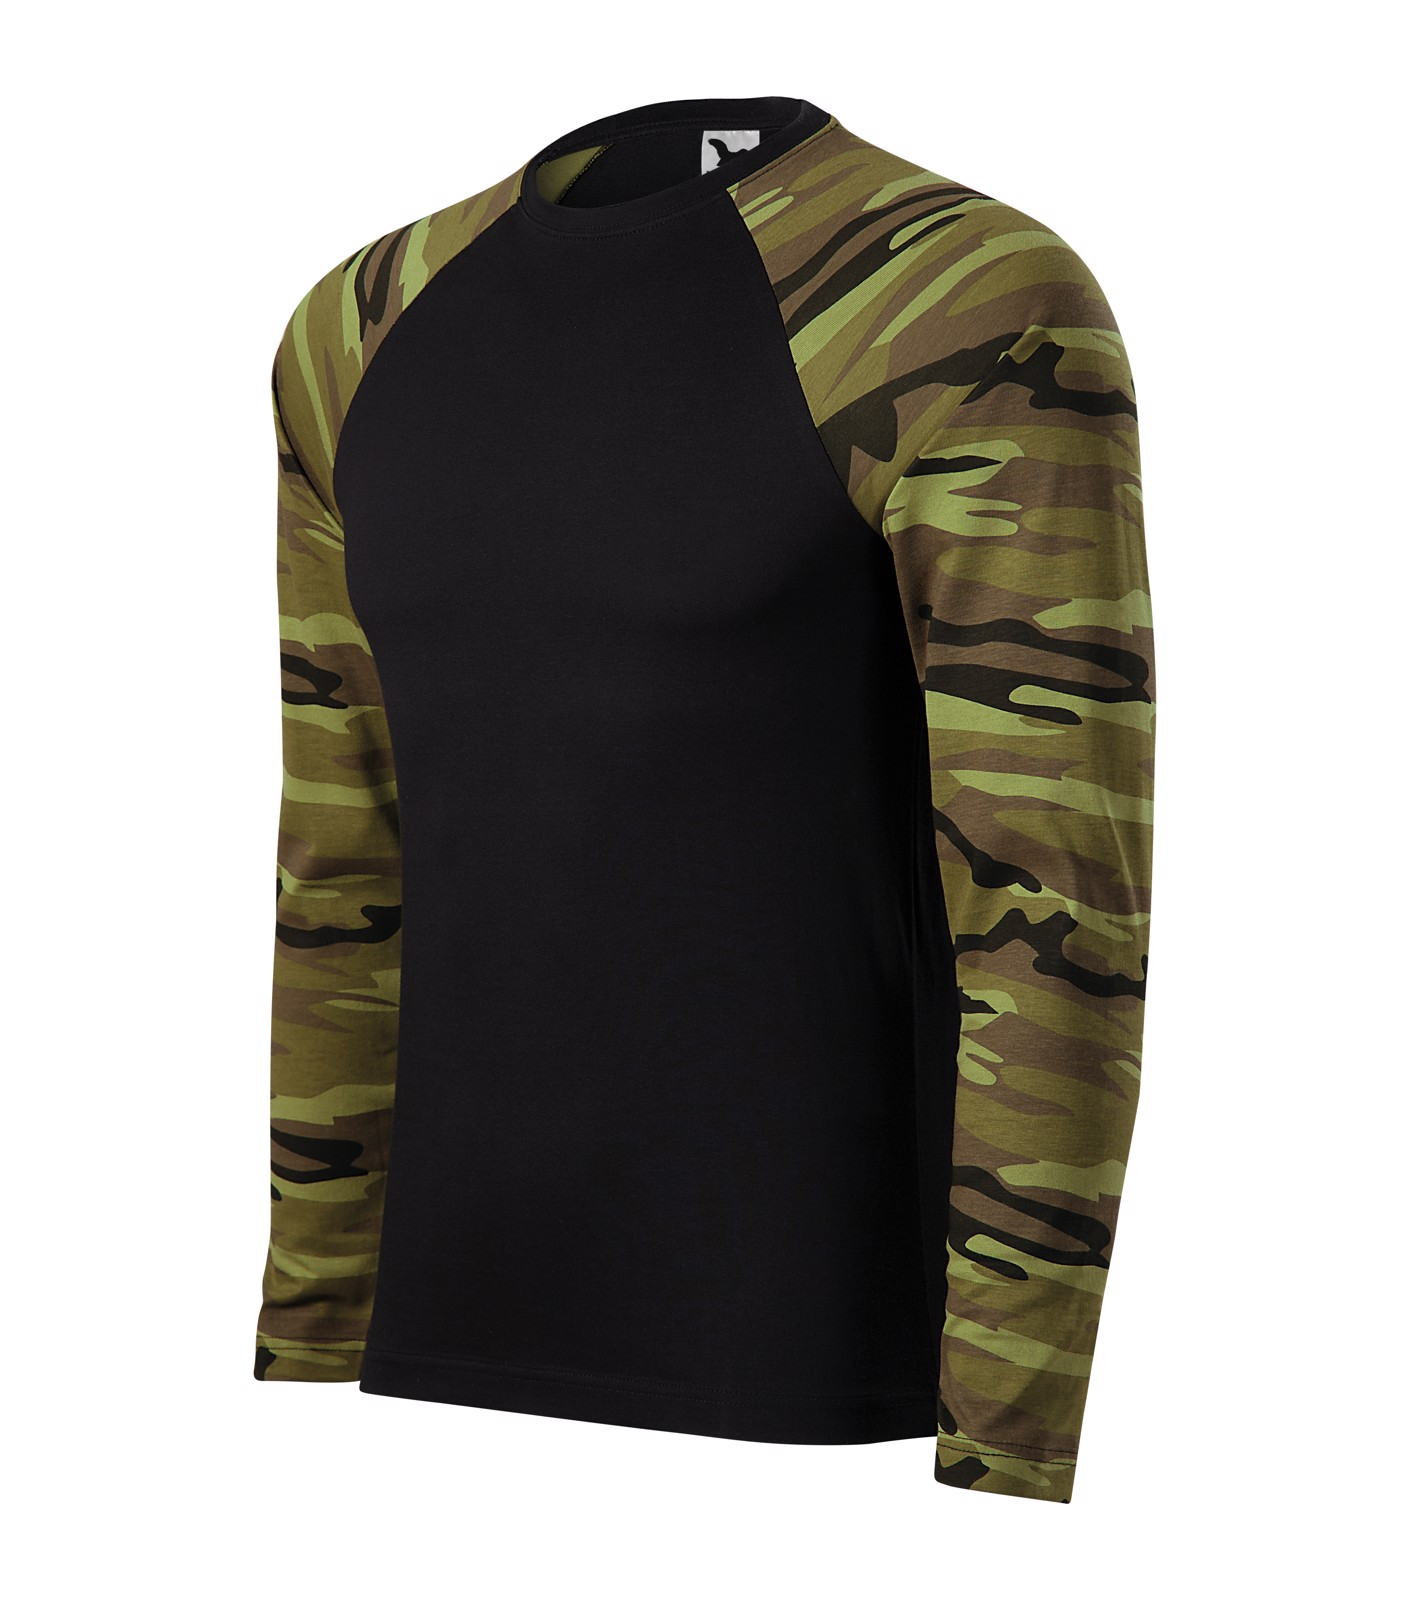 T-shirt unisex Malfini Camouflage LS - Camouflage Green / XL